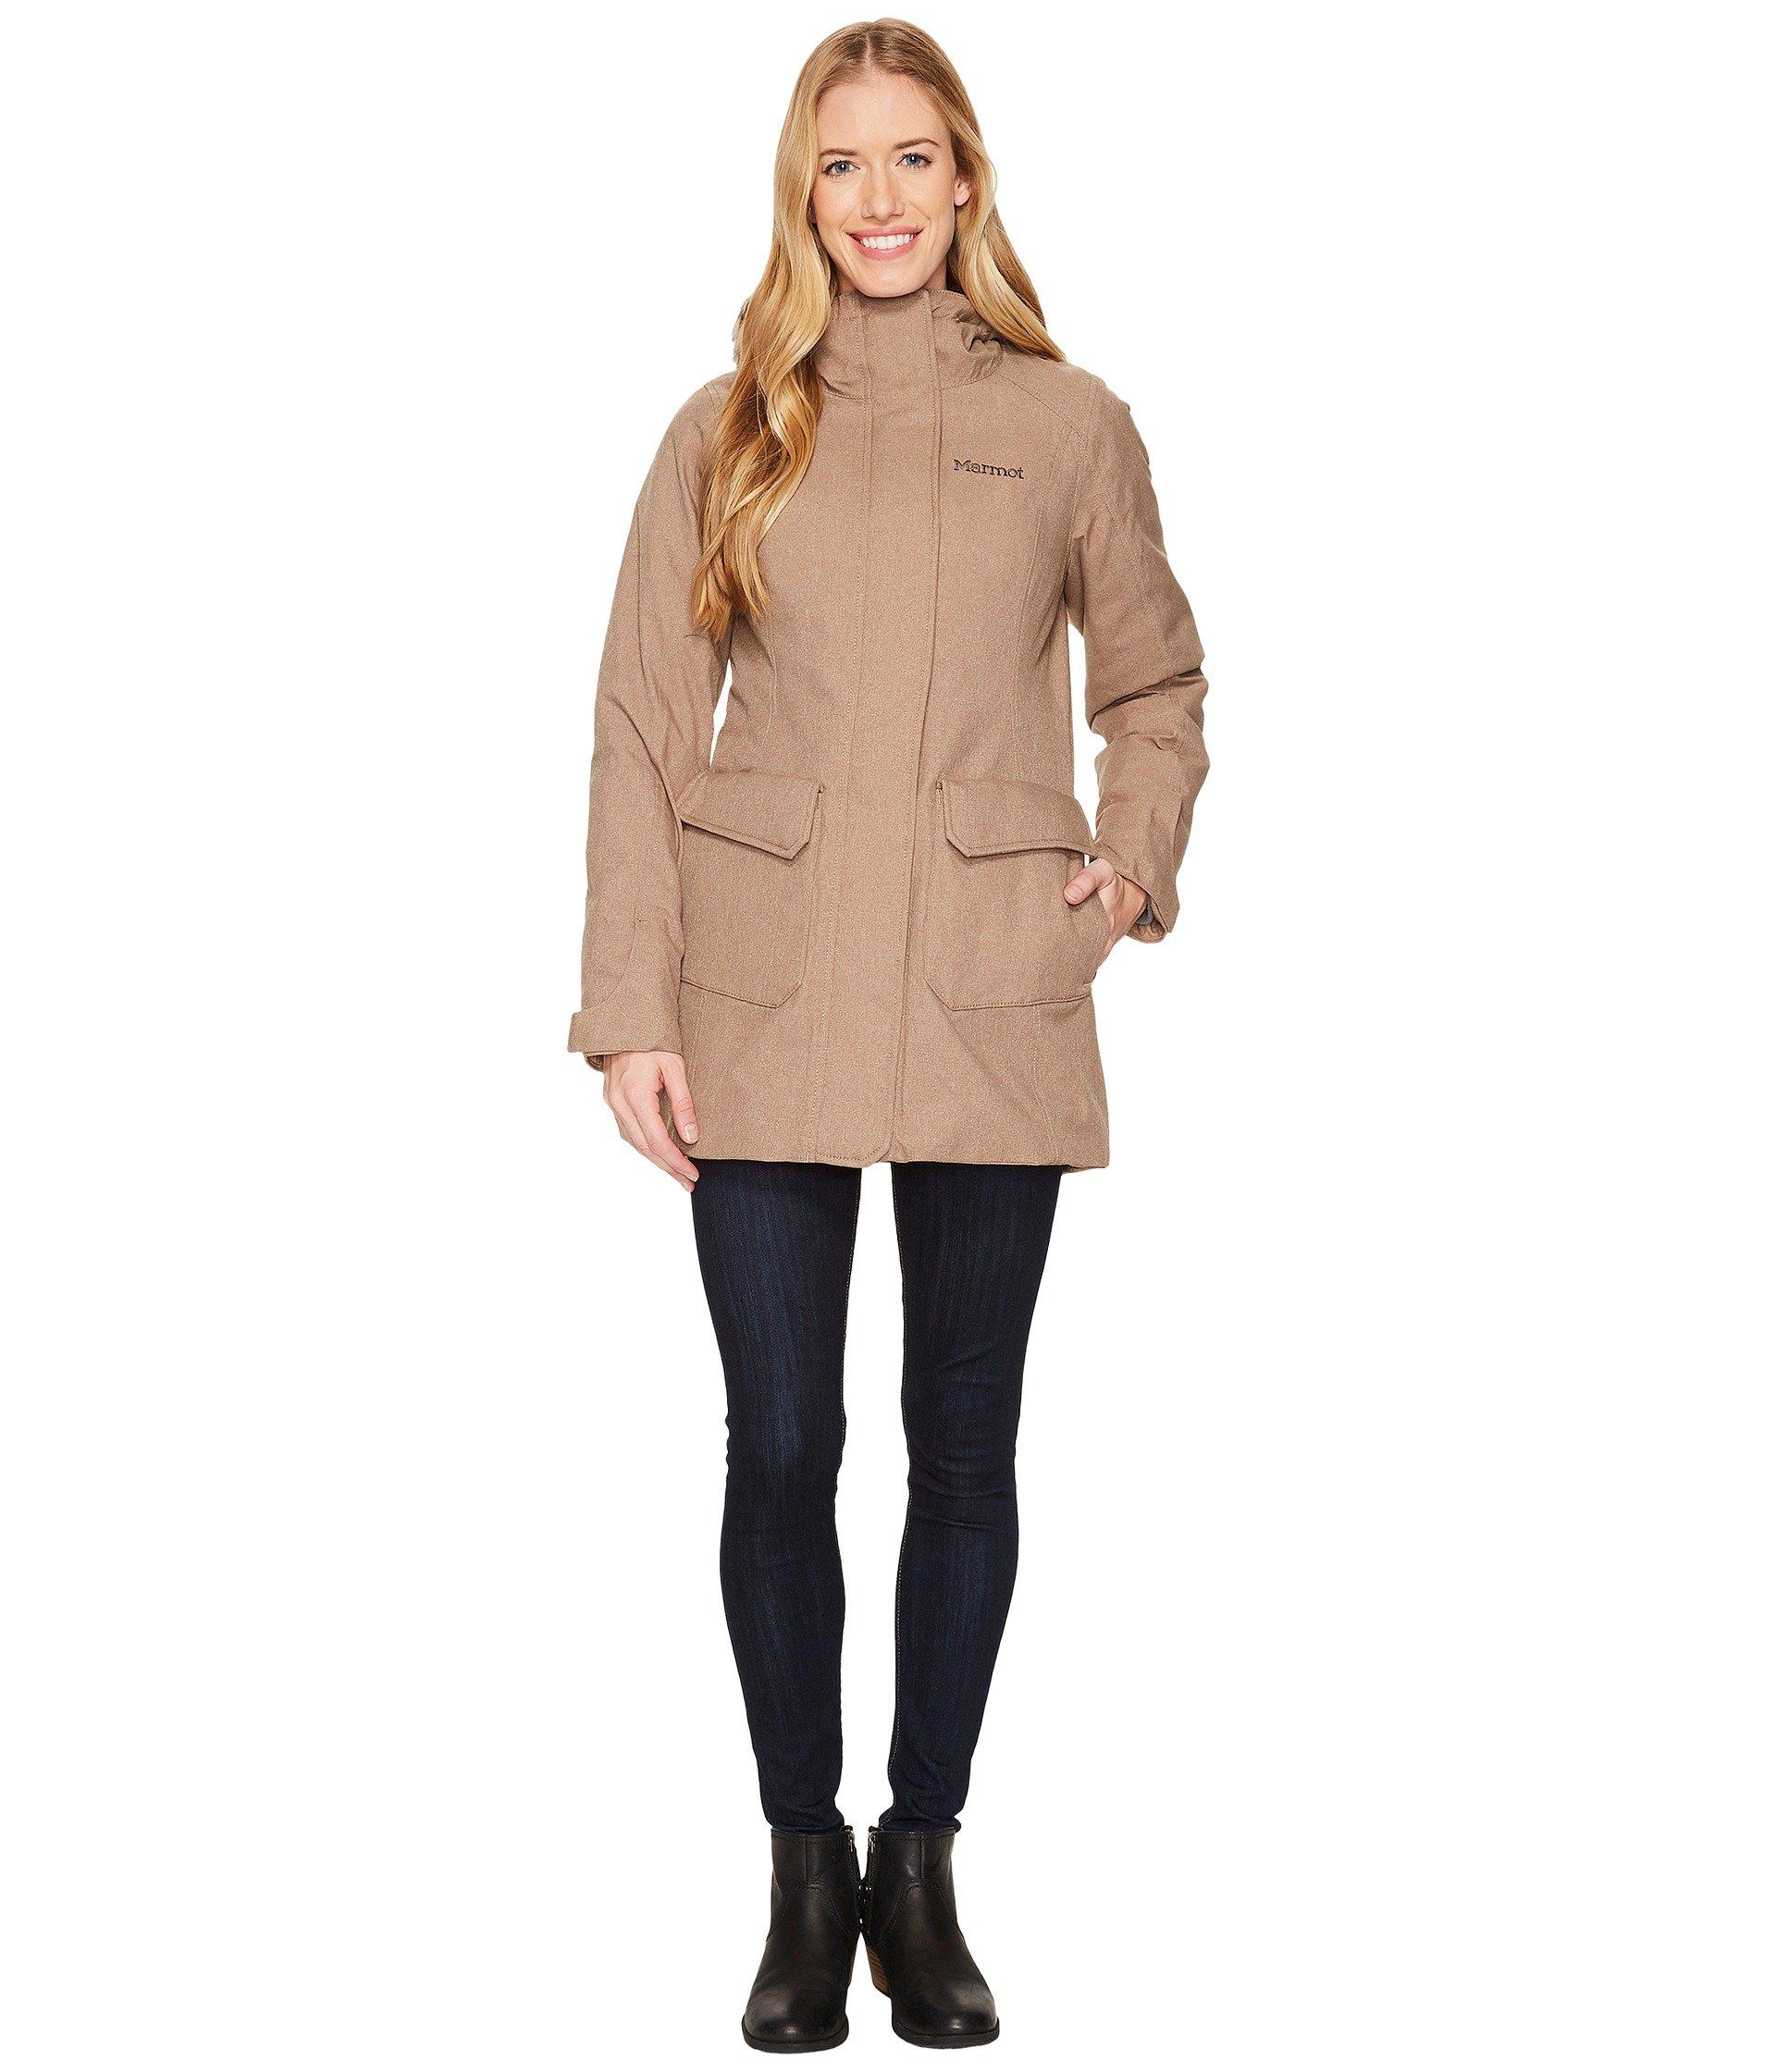 Georgina Featherless Jacket